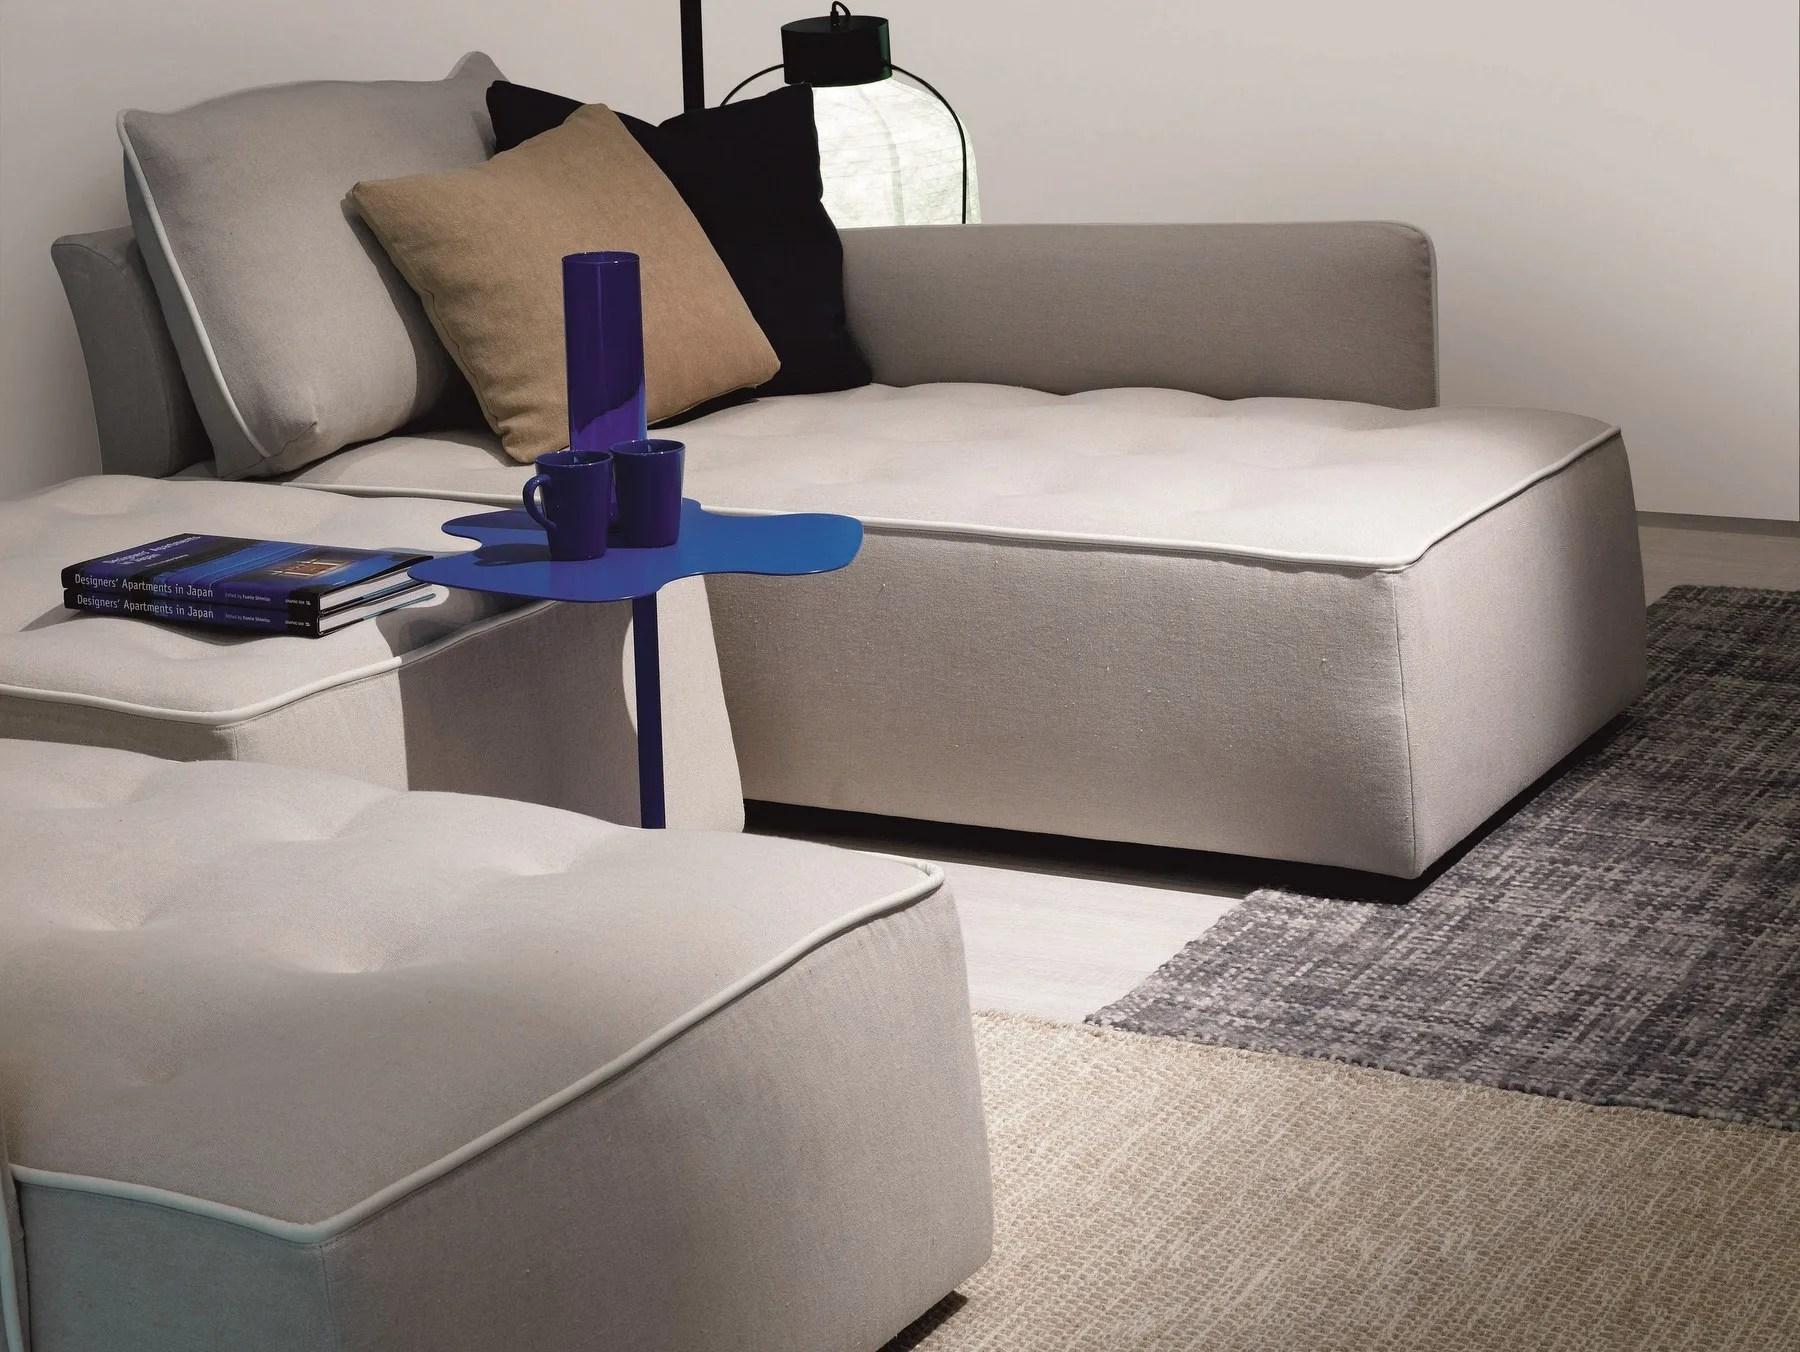 casa italy sofa bed harga murah jakarta antares day by bontempi design marco corti